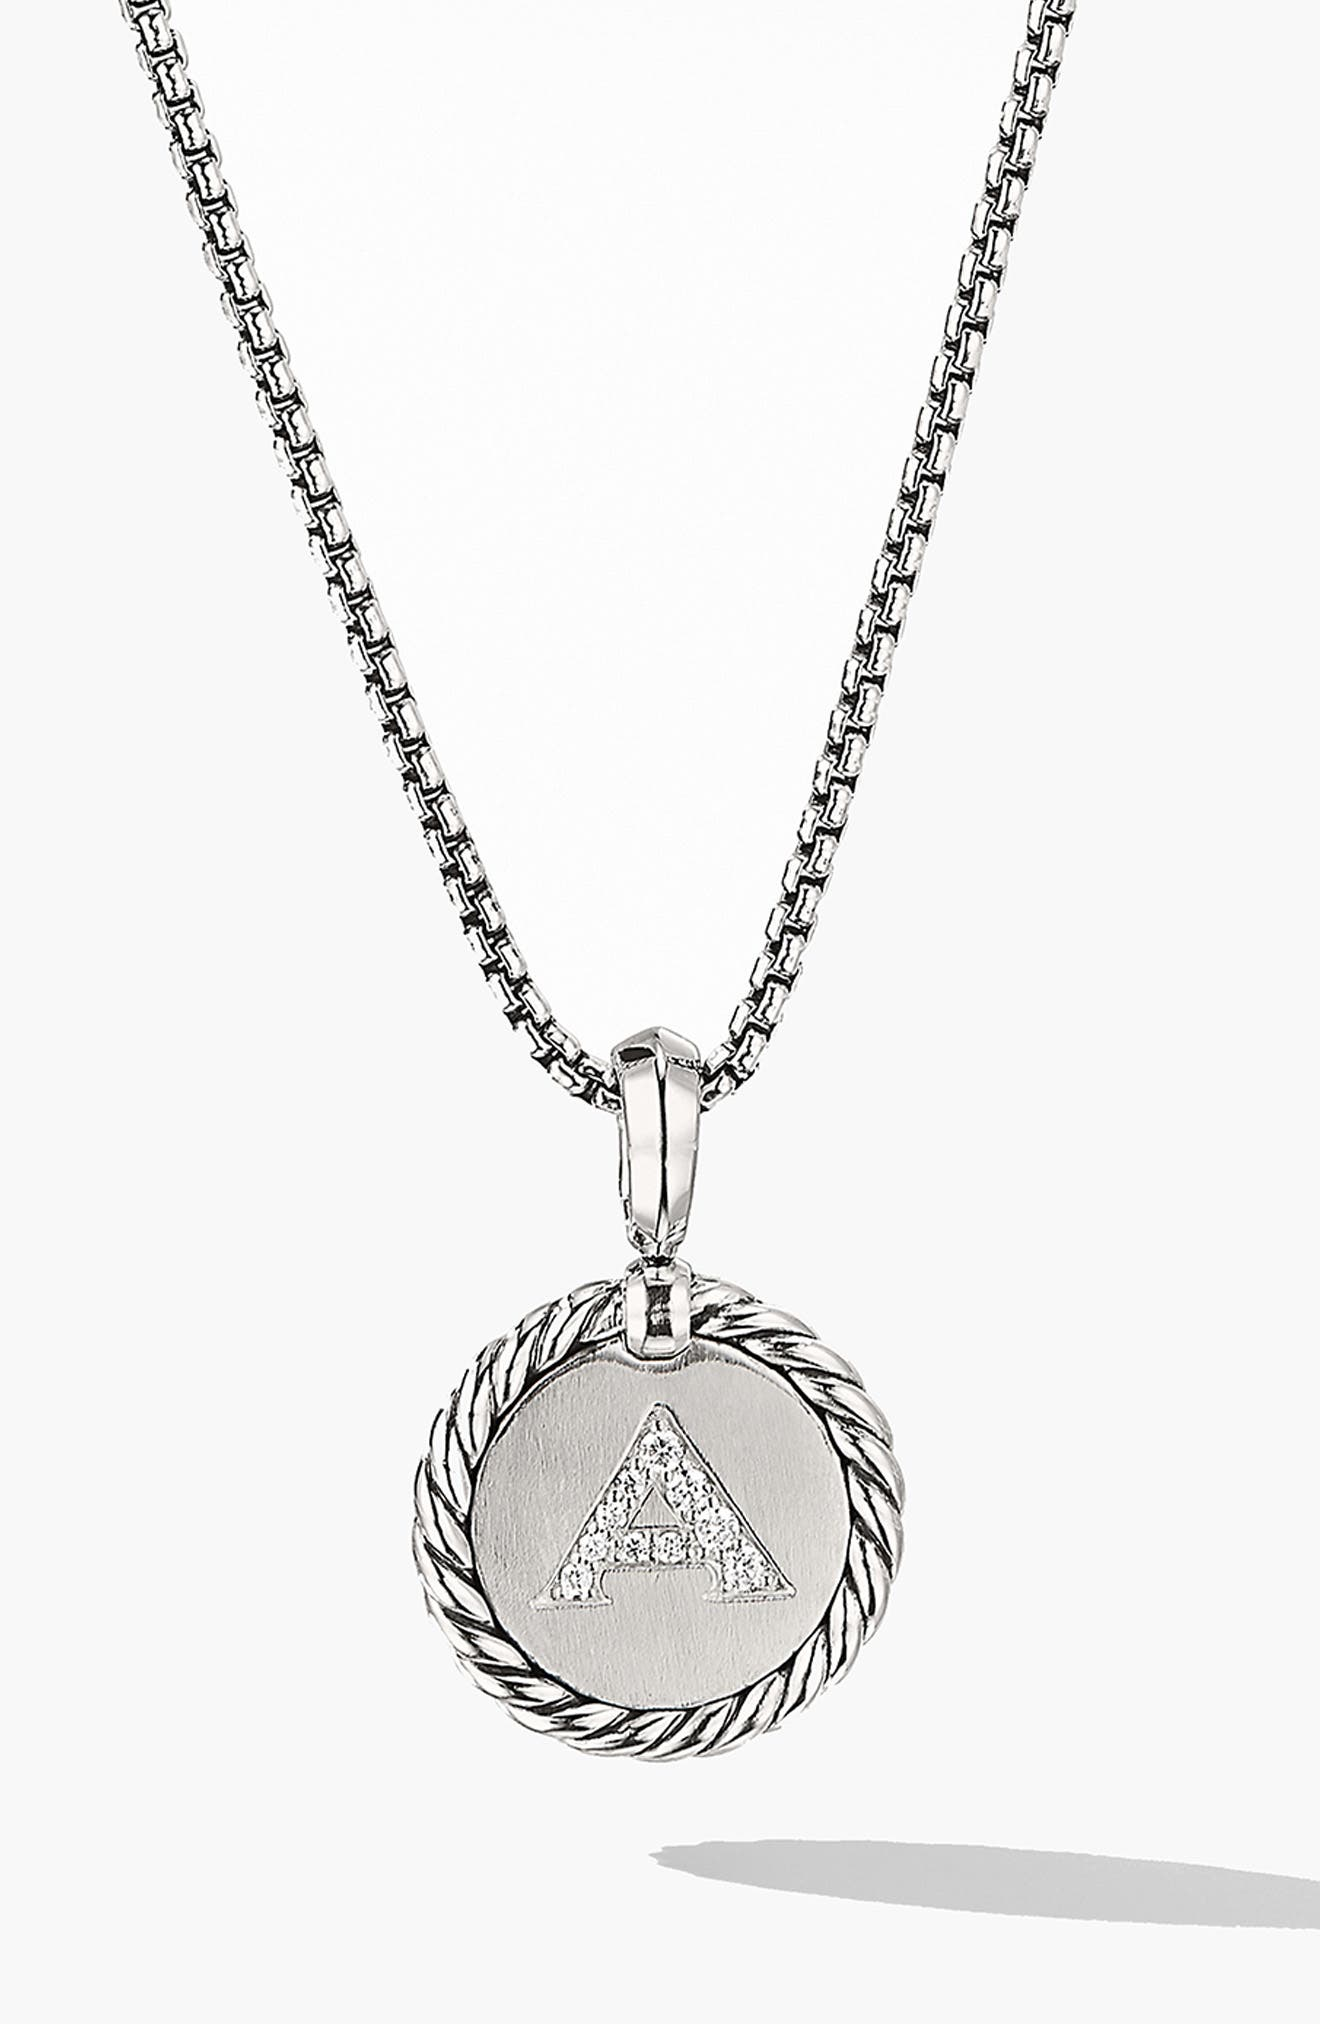 DAVID YURMAN, Initial Charm Necklace with Diamonds, Main thumbnail 1, color, SILVER/ DIAMOND-A